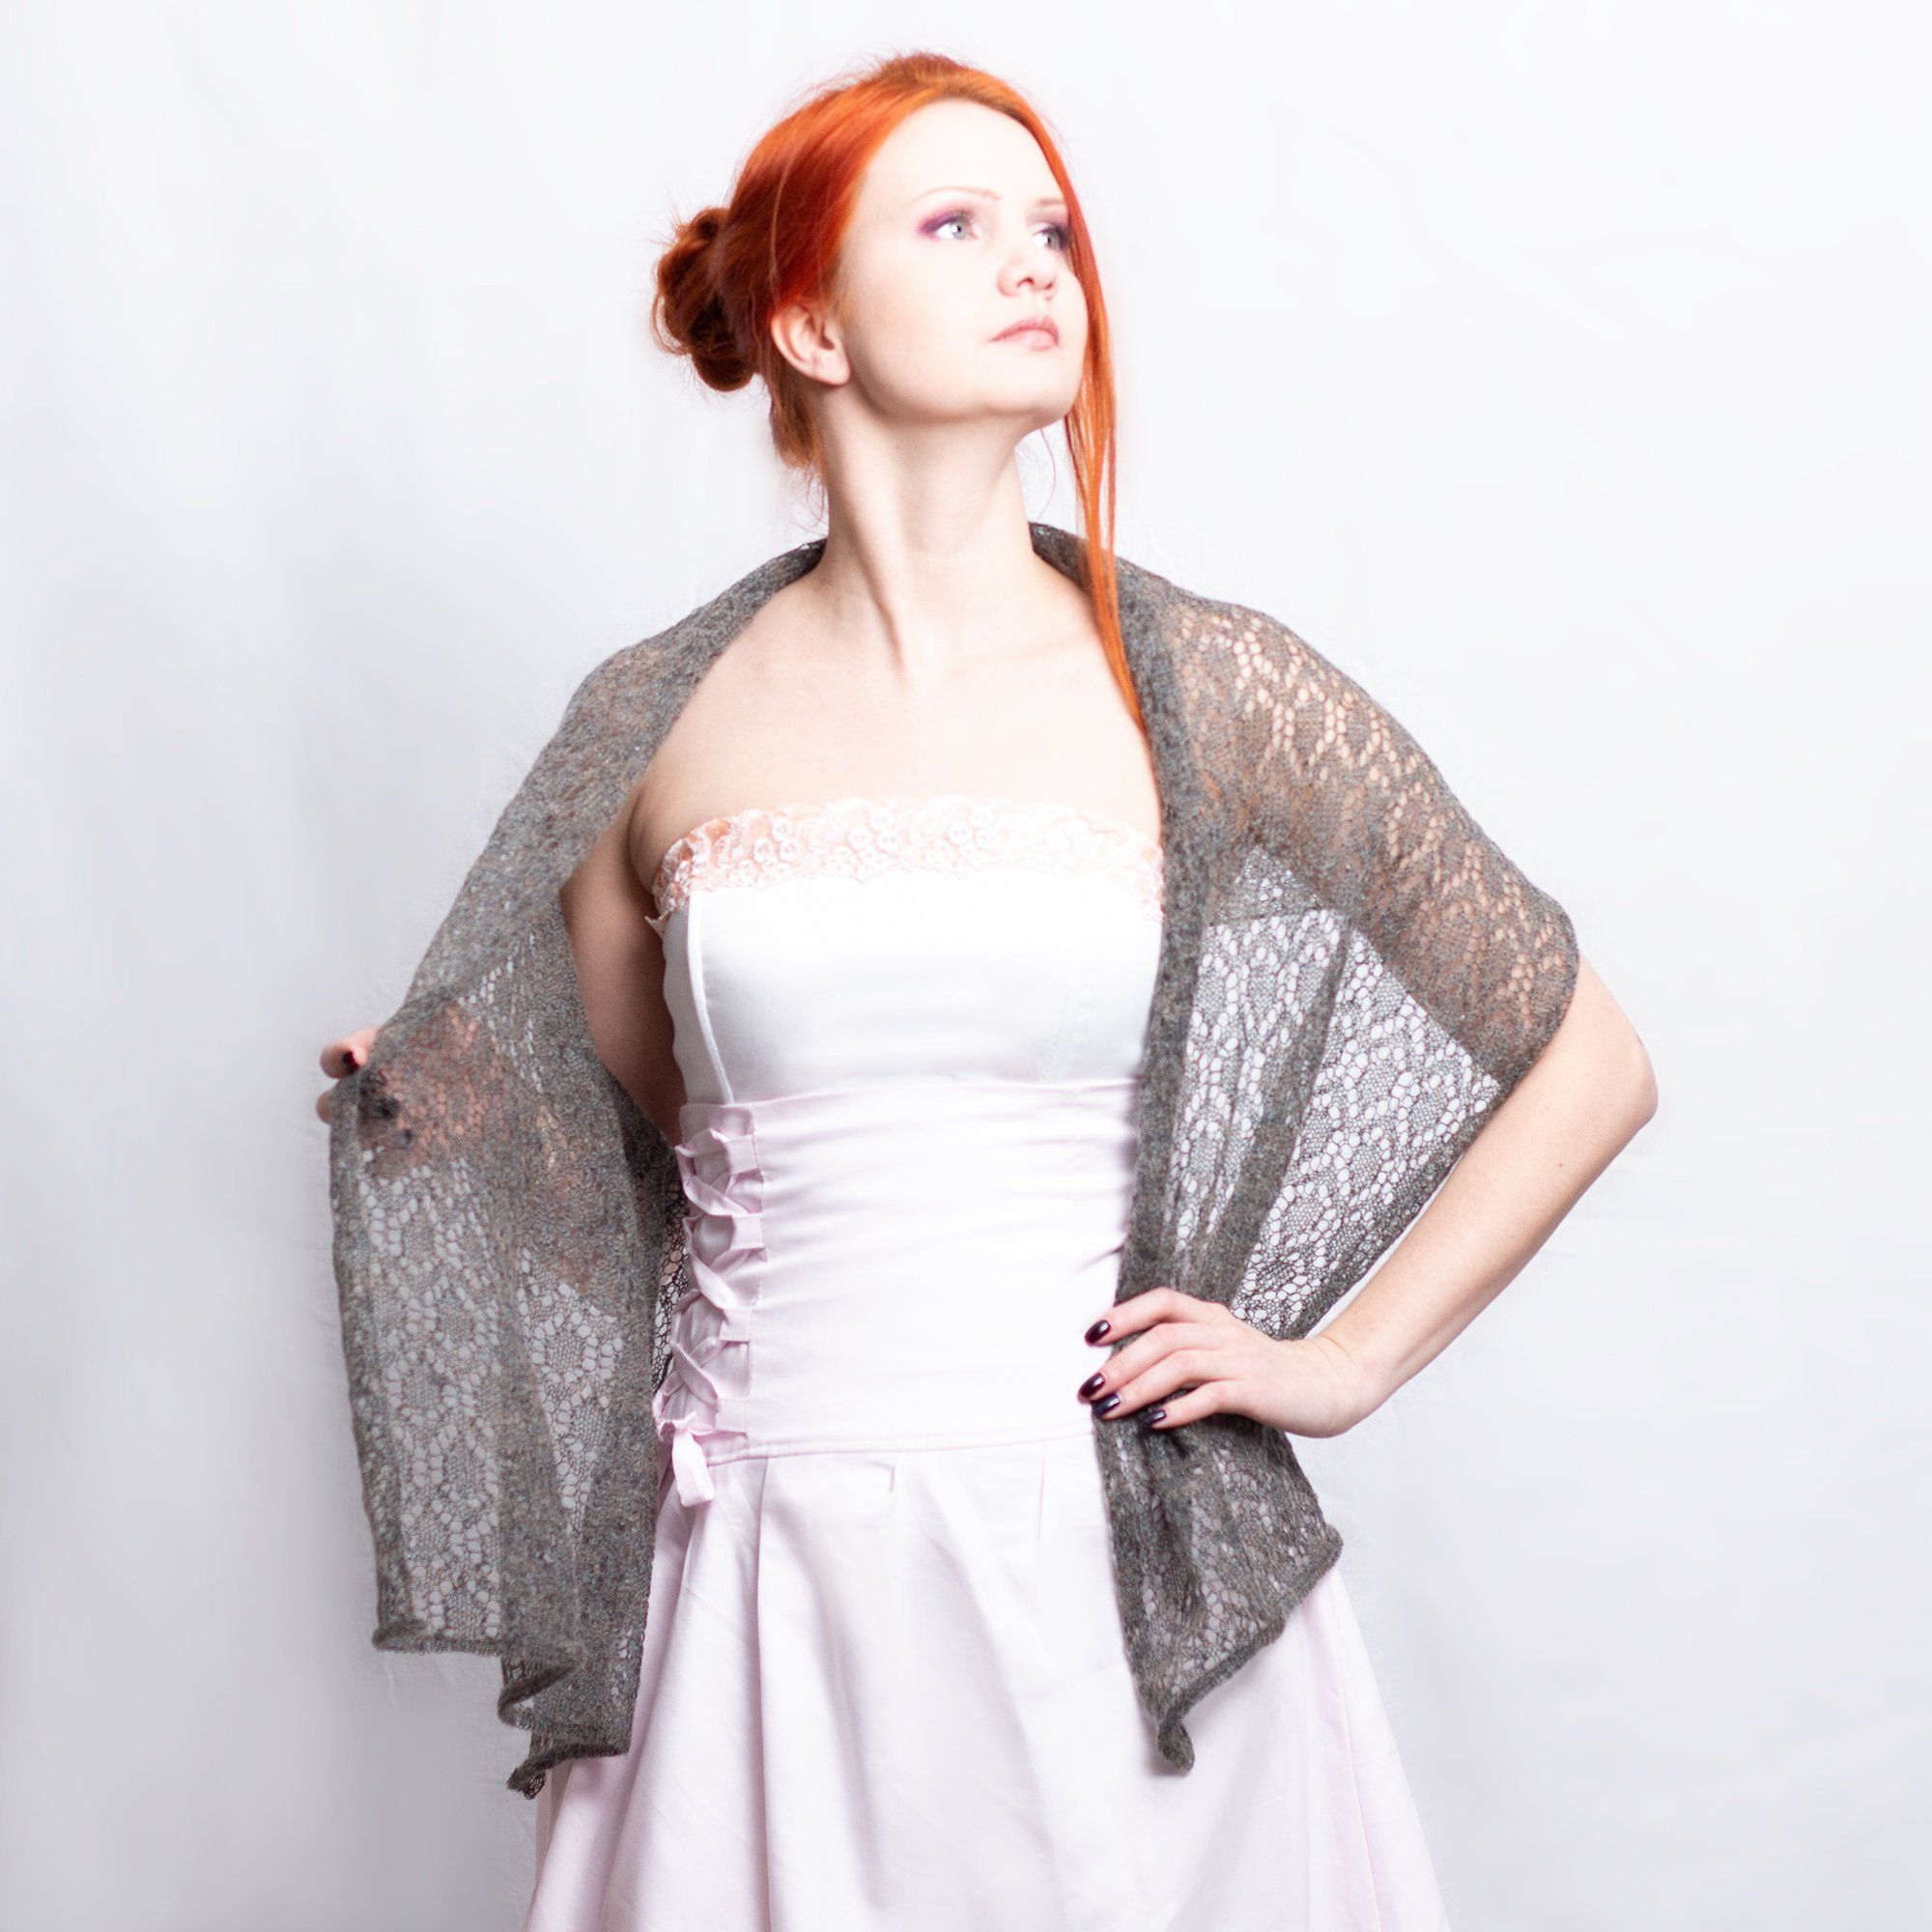 55395cc07d #Gray #brown #bridal #shawl, Lace knit bridal shawl, Black #metallic #Knit #wedding  lace shawl #knitwear #fashion #handmade